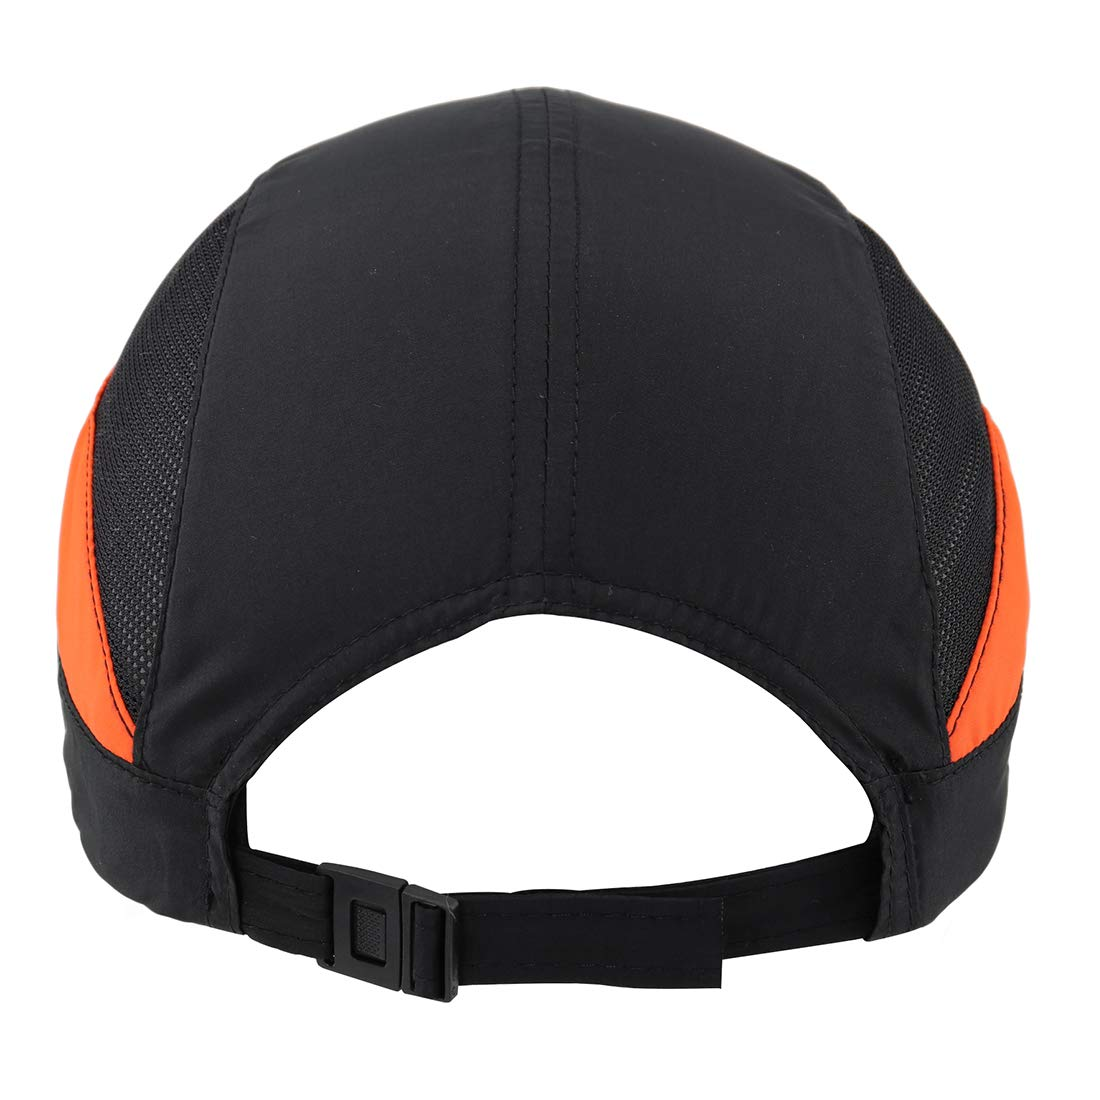 Gisdanchz 7-7 1//2 Quick Dry Breathable Ultralight Running Hat for Sport